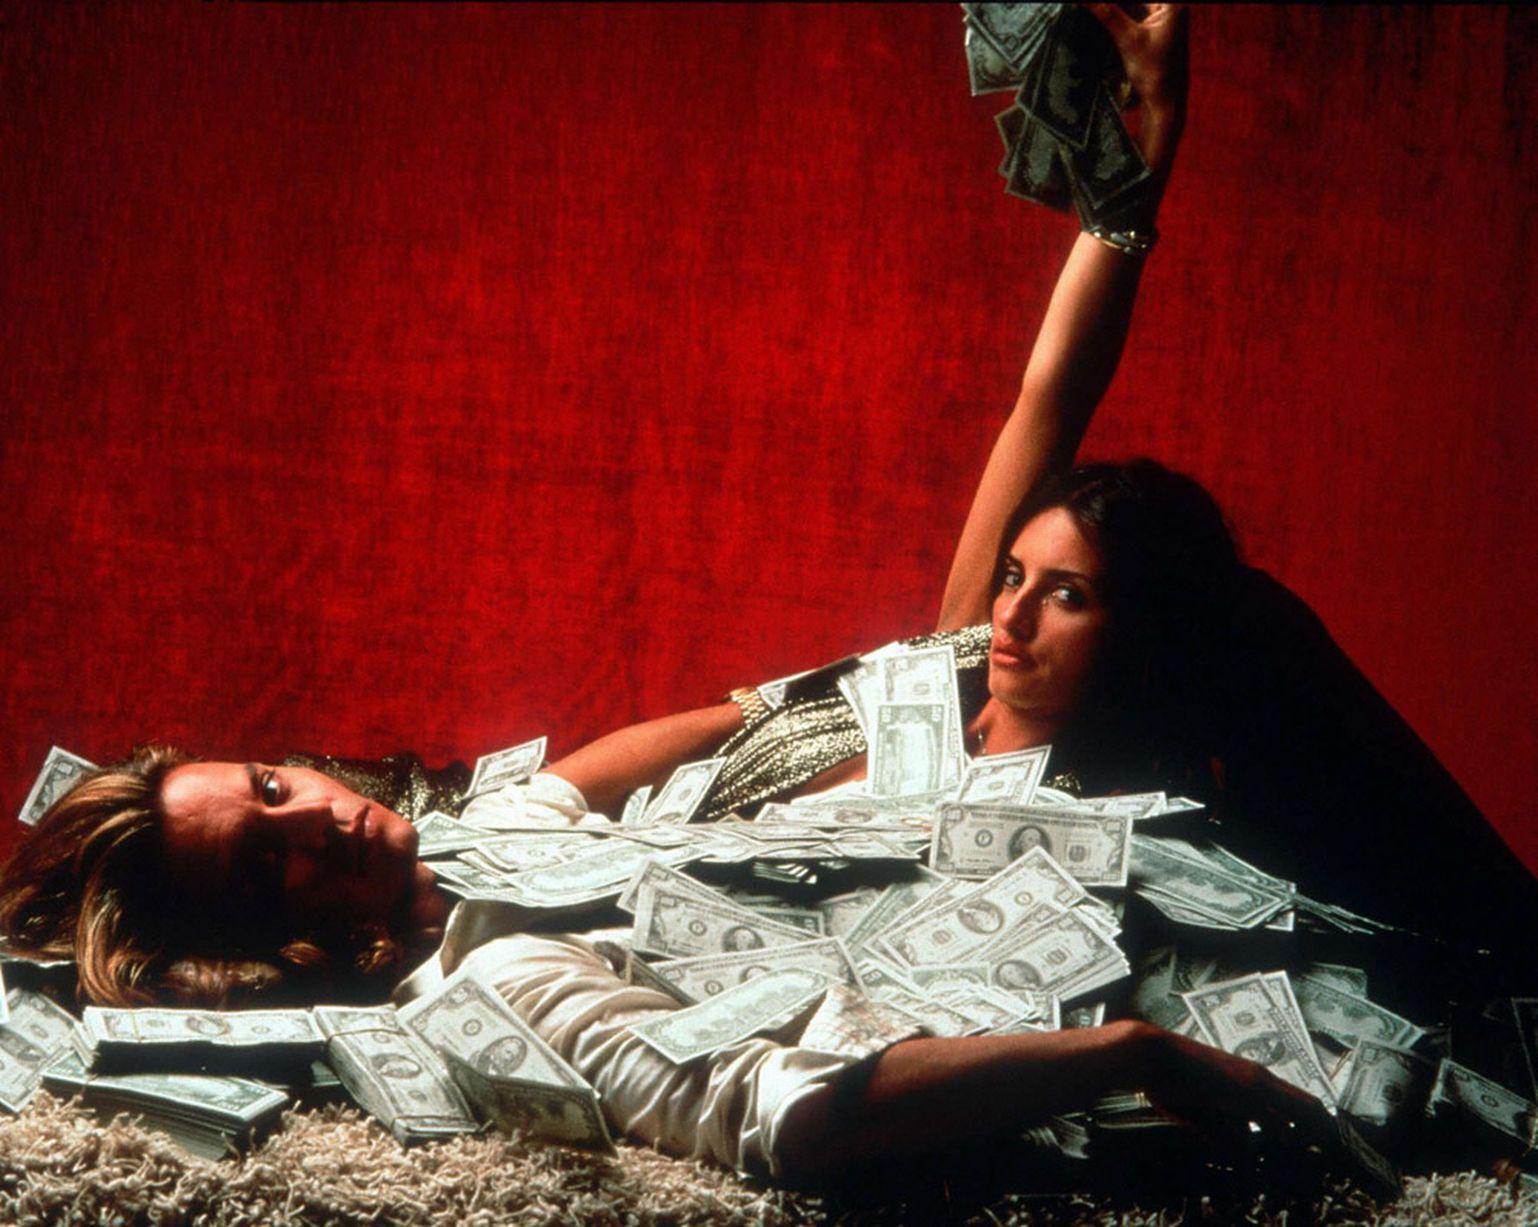 Johnny-Depp-and-Penelope-Cruz-in-Blow-2001